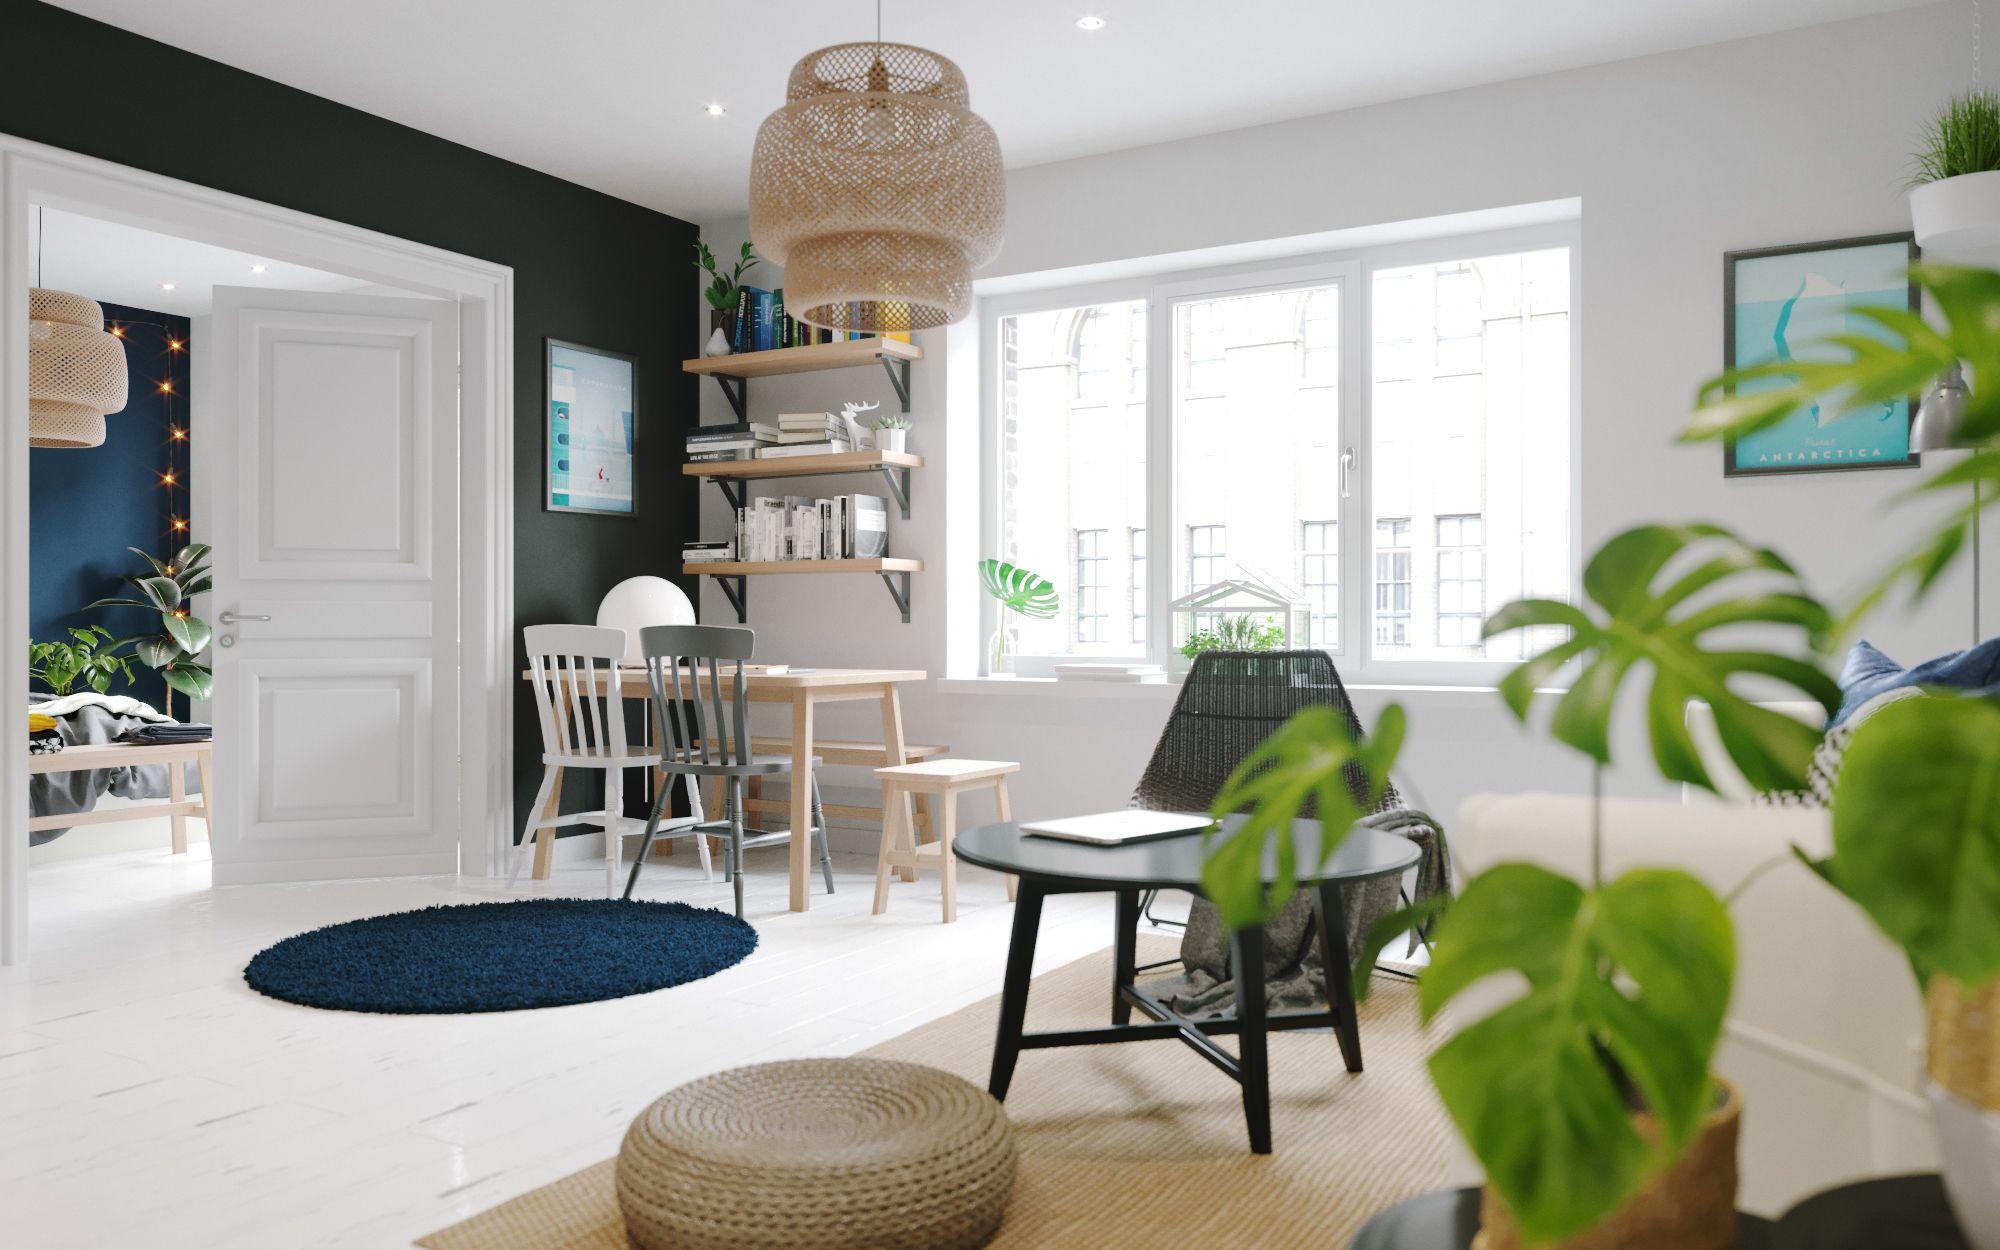 A small apartment boasts a scandinavian interior bliss in warsaw www essentialhome eu blog midcentury architecture interiordesign homedecor